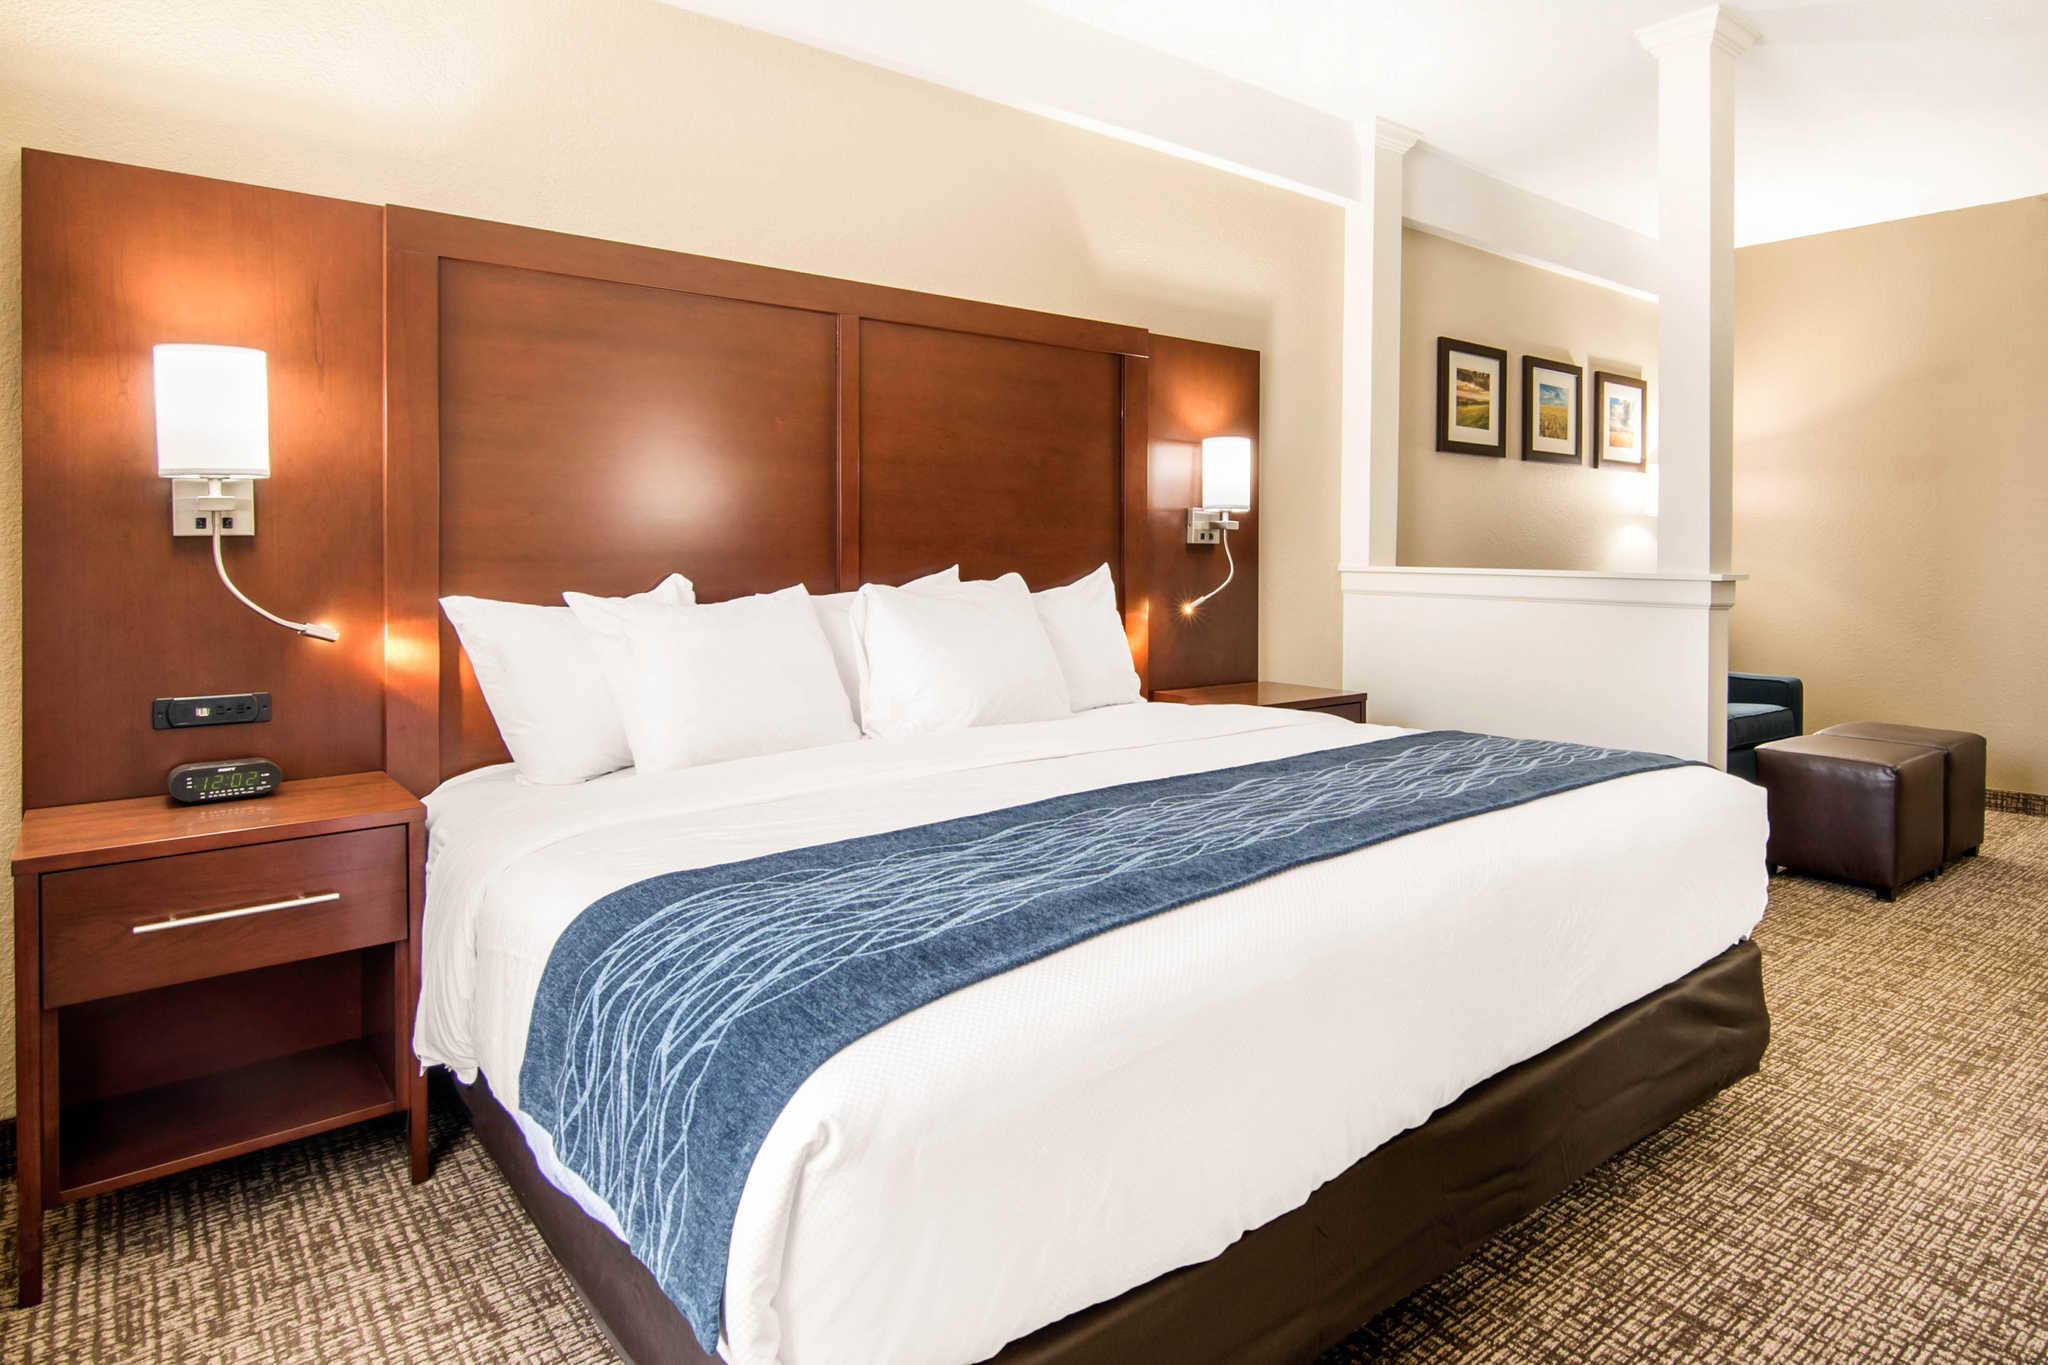 Comfort Inn & Suites Junction City - near Fort Riley image 20